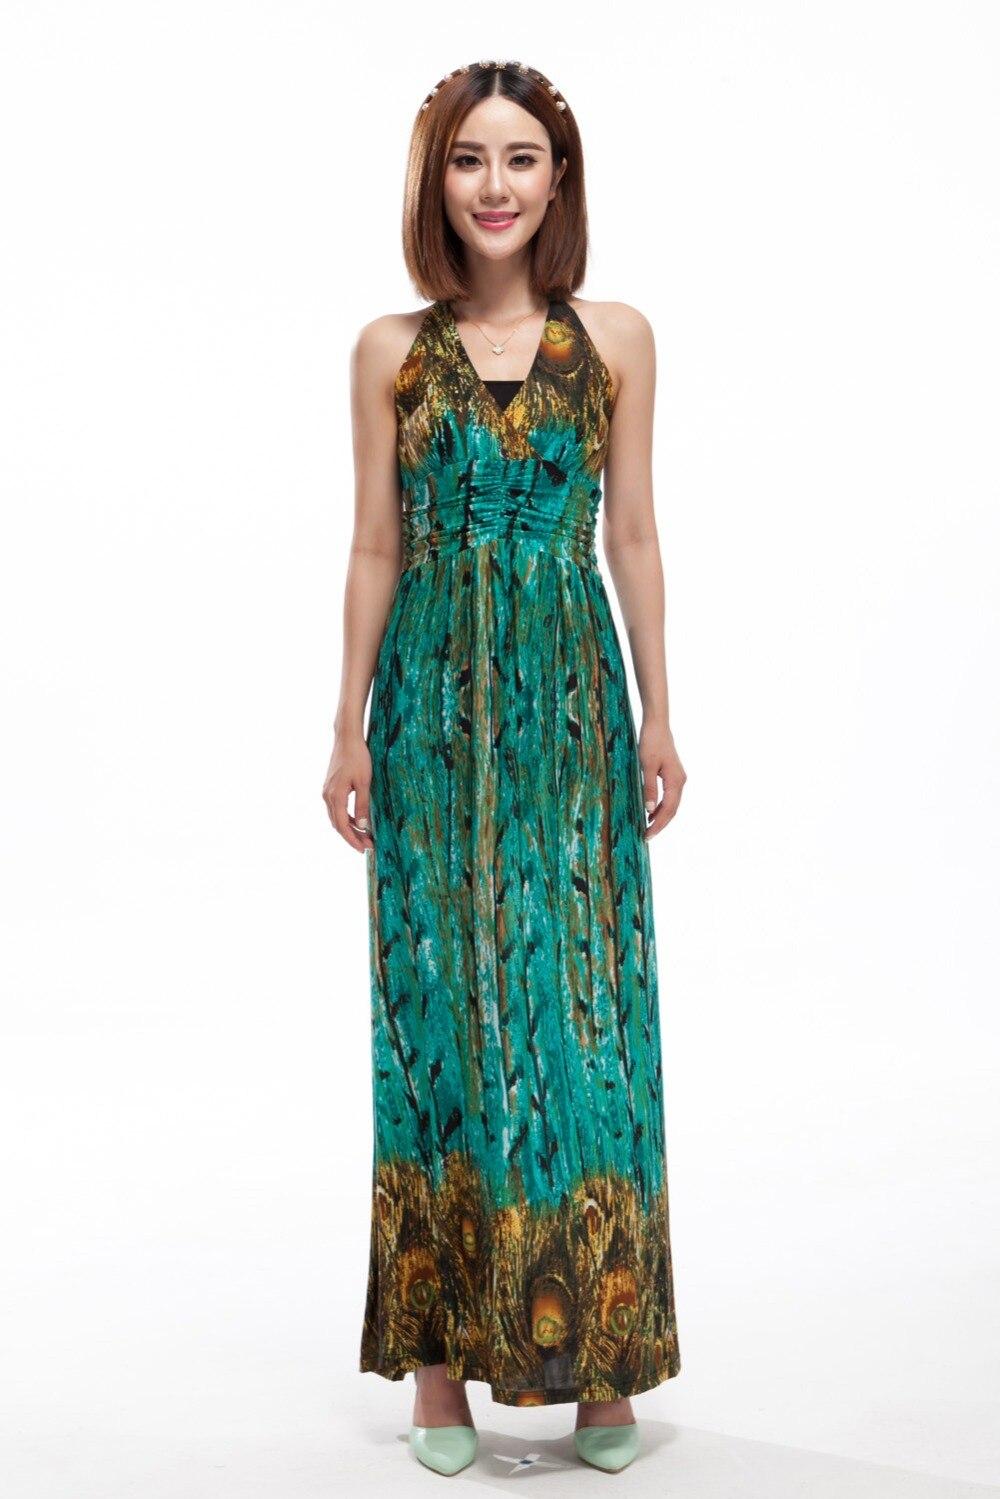 Boho Dresses plus size women clothing Ice Silk High Quality Beach Summer  maxi dress L XL XXL XXXL 4XL 5XL 6XL b399c643cf3d